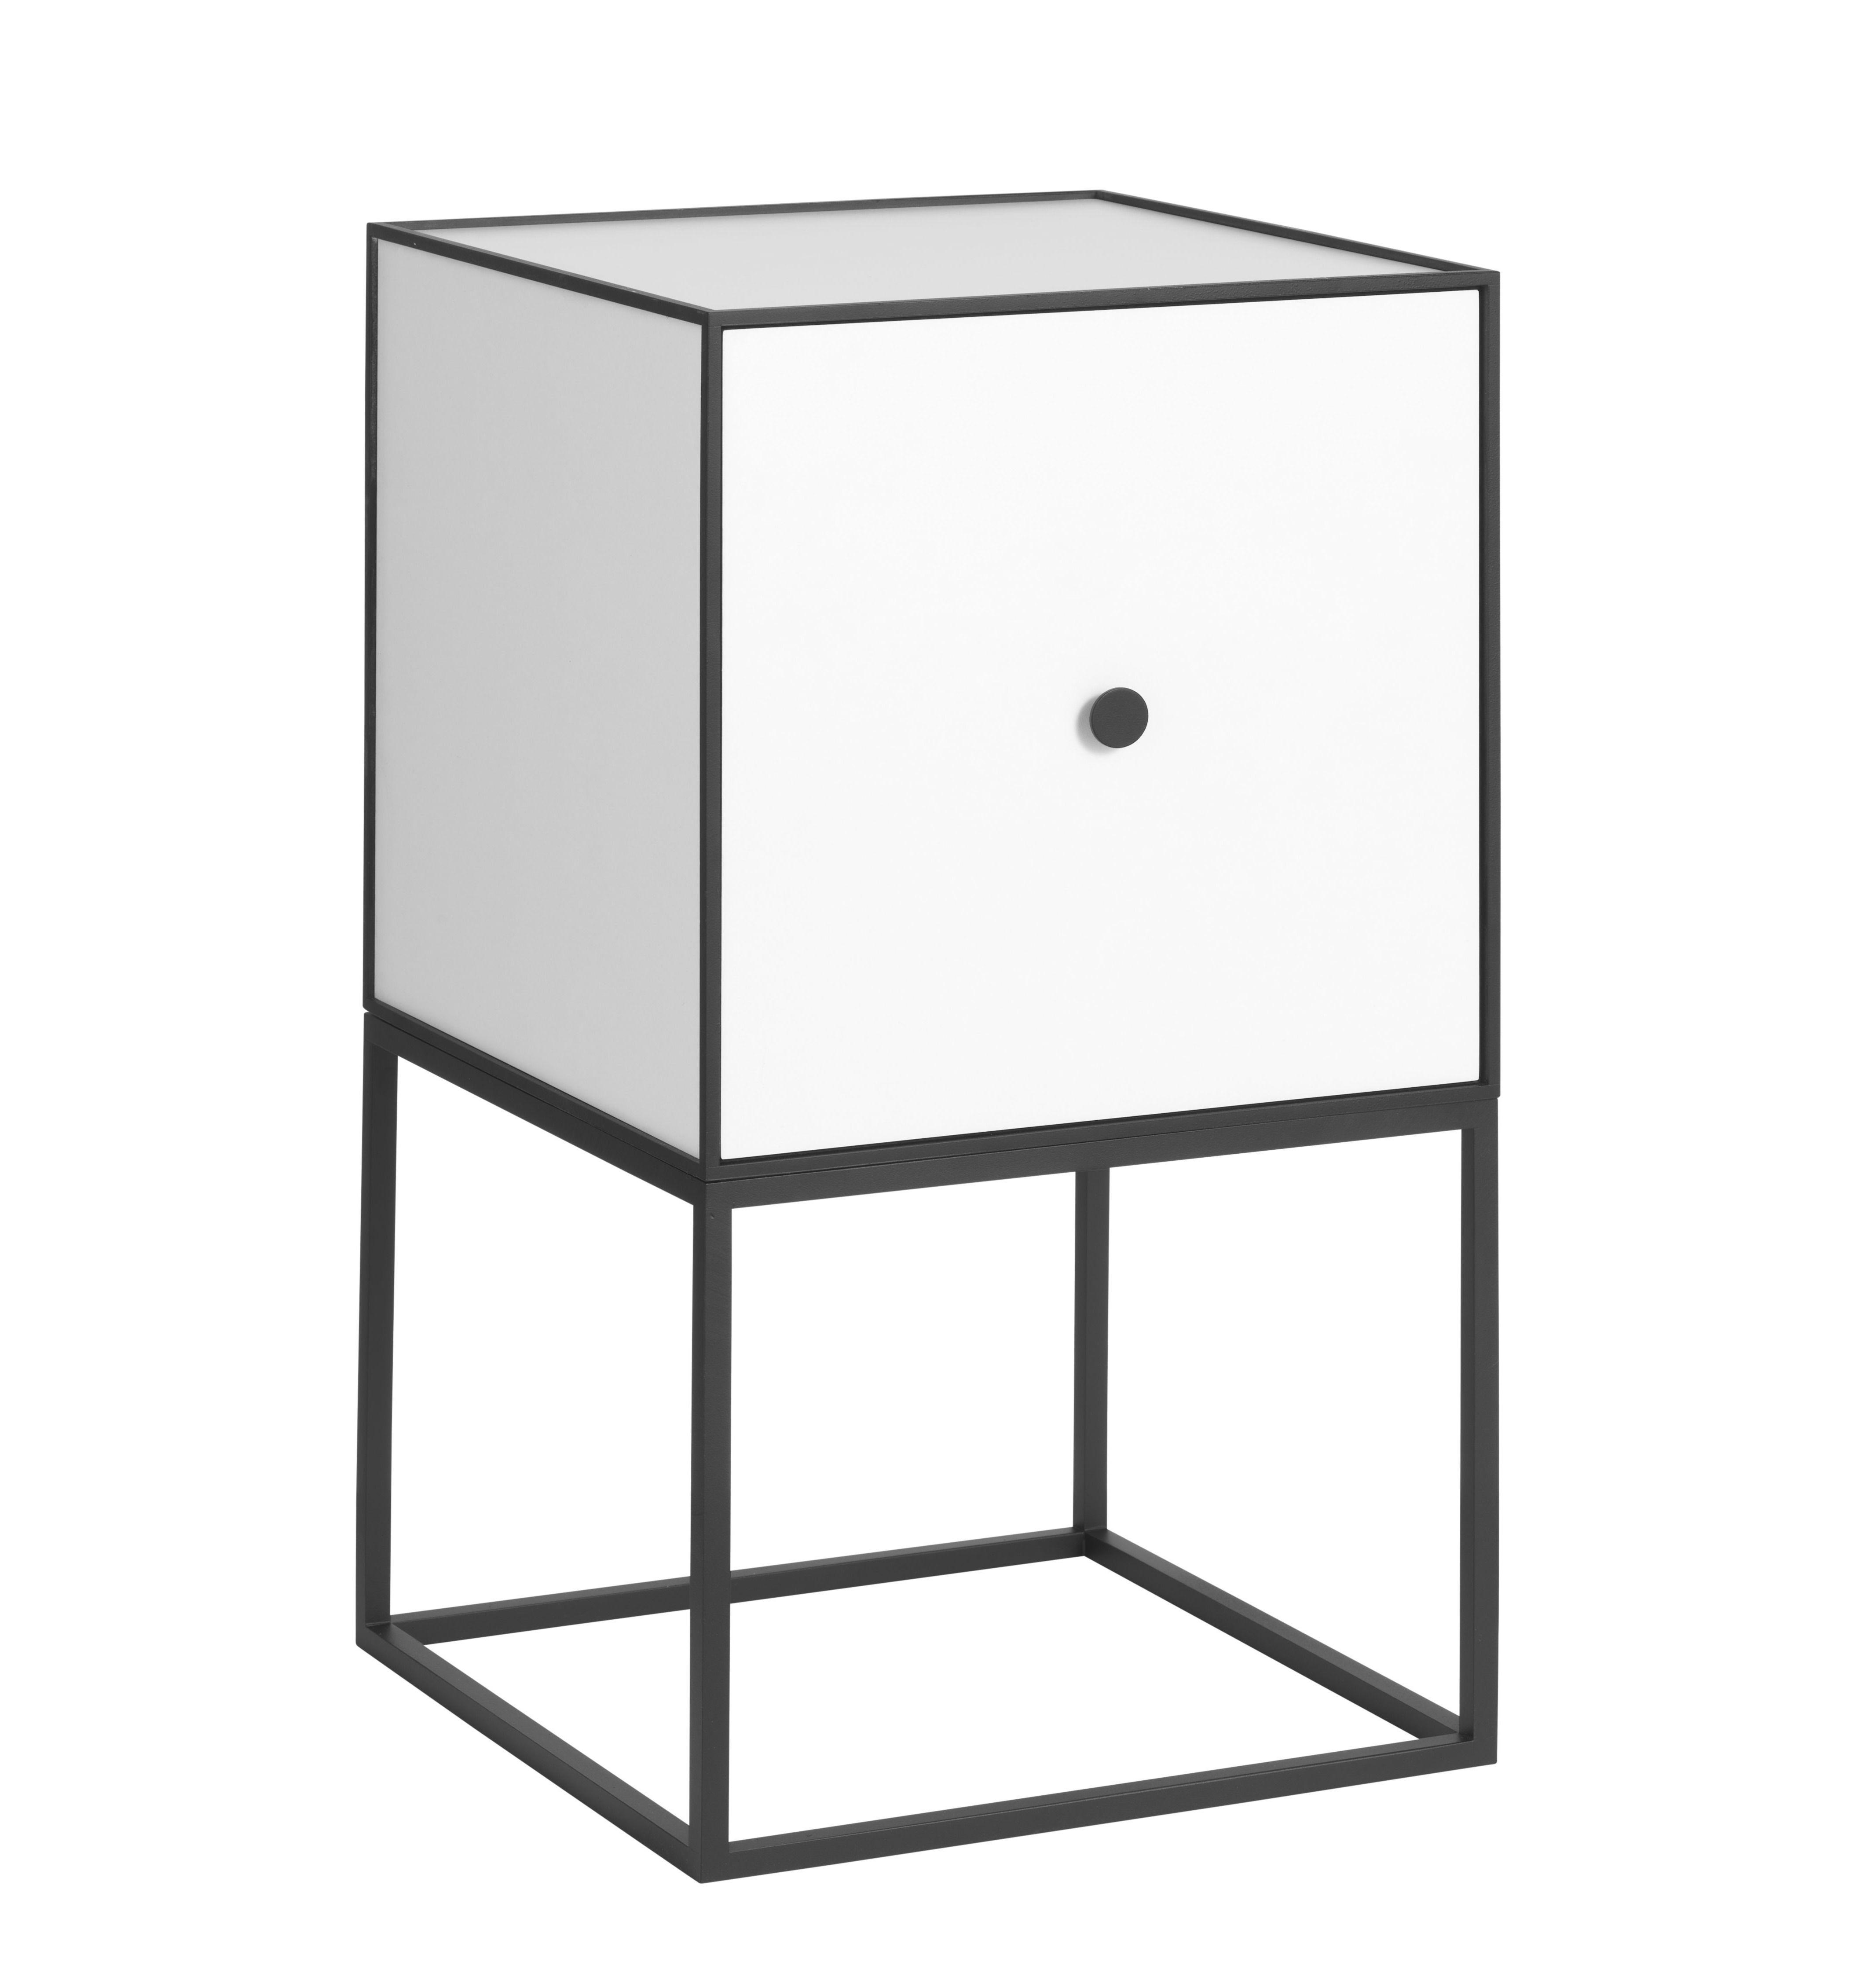 by Lassen - Frame 35 m/Låge - Hvid - Reol i hvid med låge